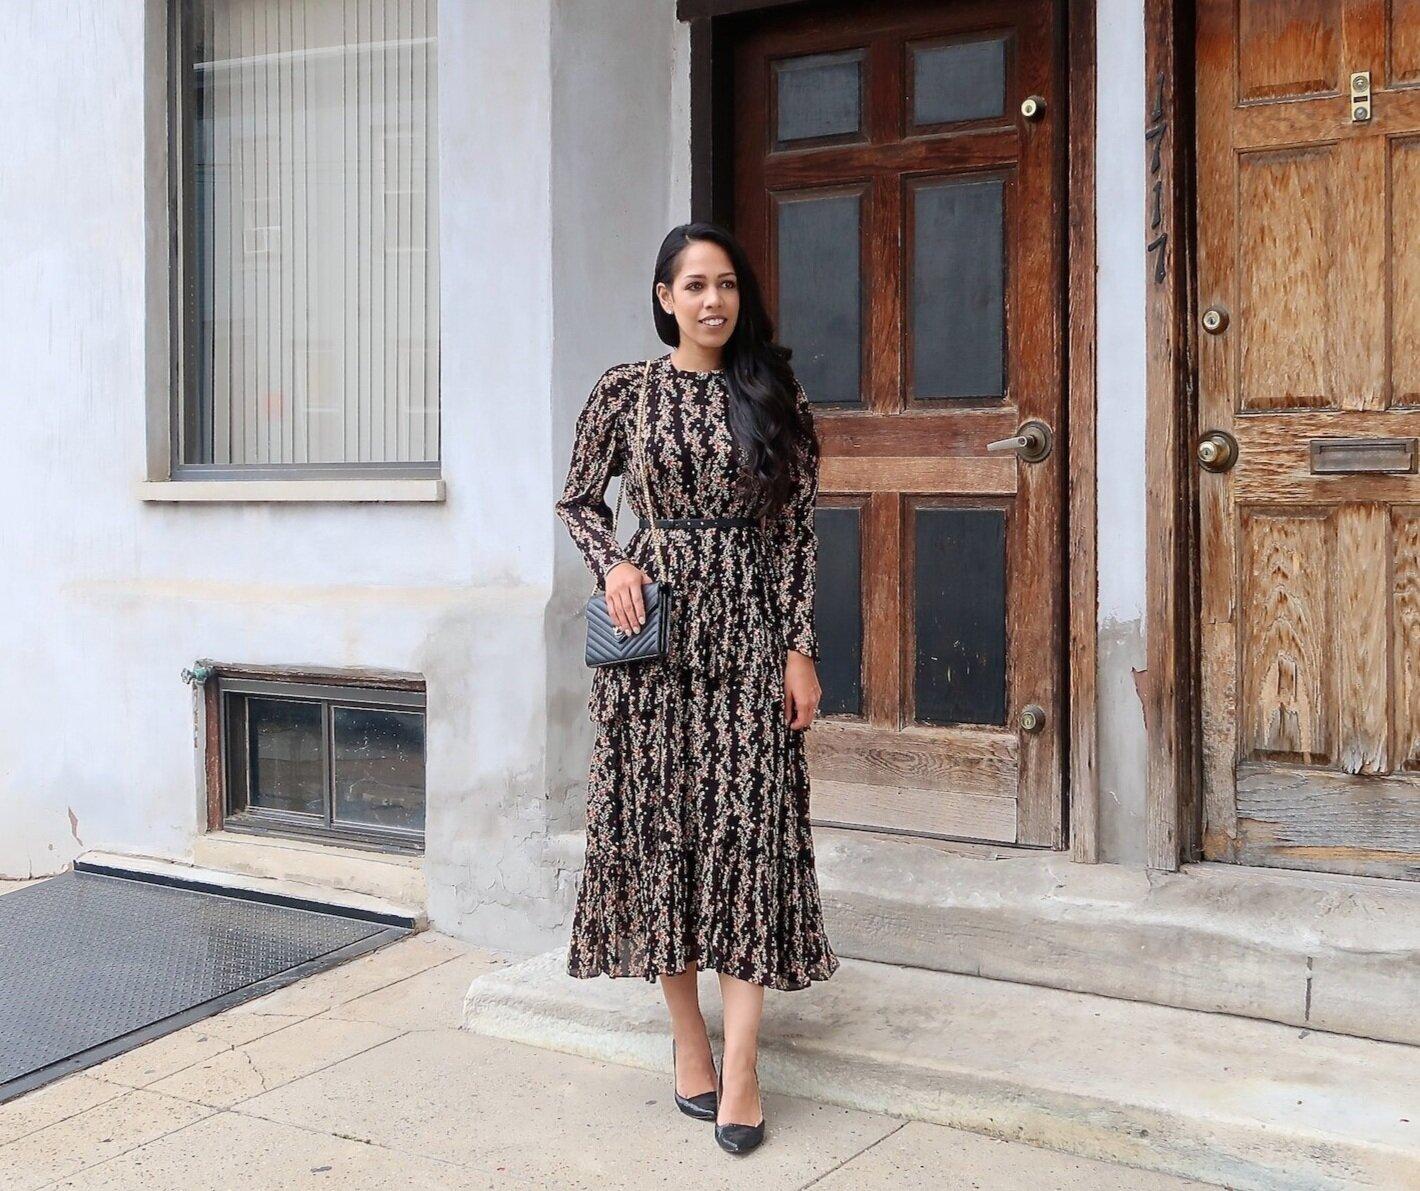 10-Favorite-Dresses-Wear-This-Fall-Zara-Floral.JPG